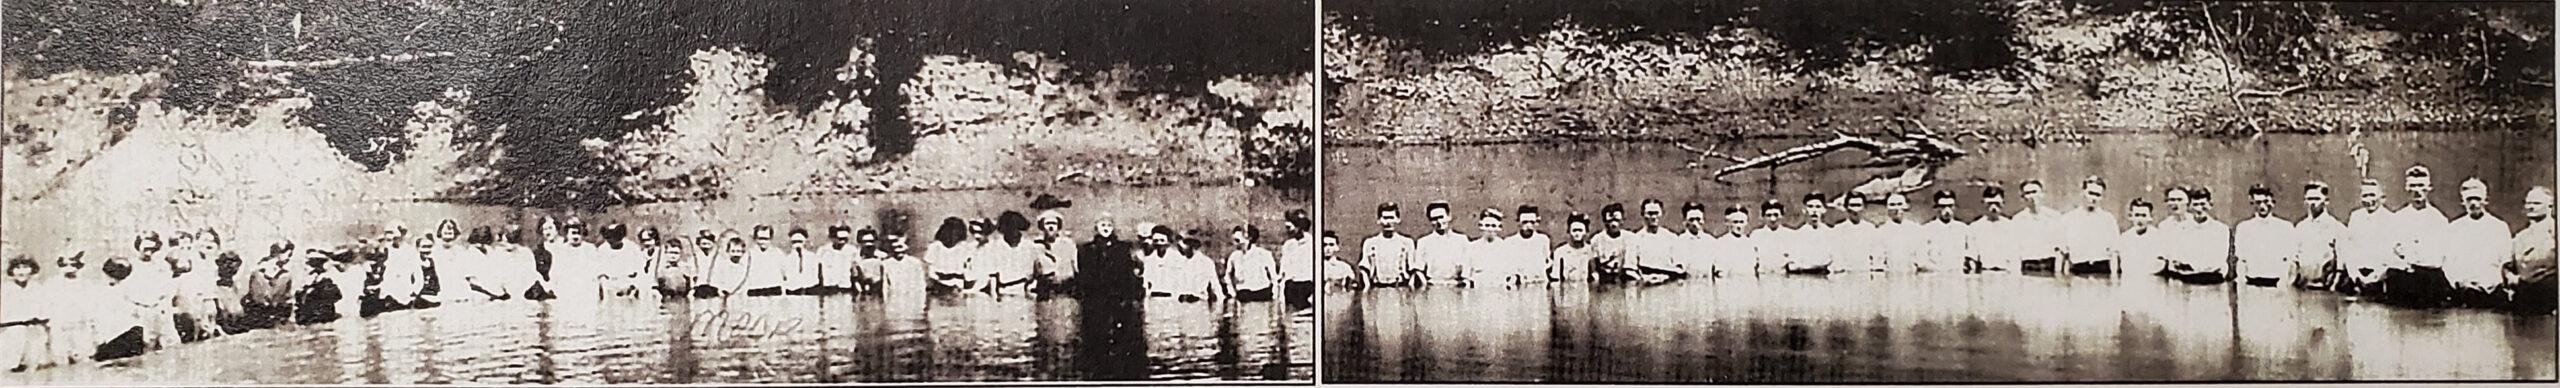 Baptismal for Charleston Baptist Church on Hatchie River 1922